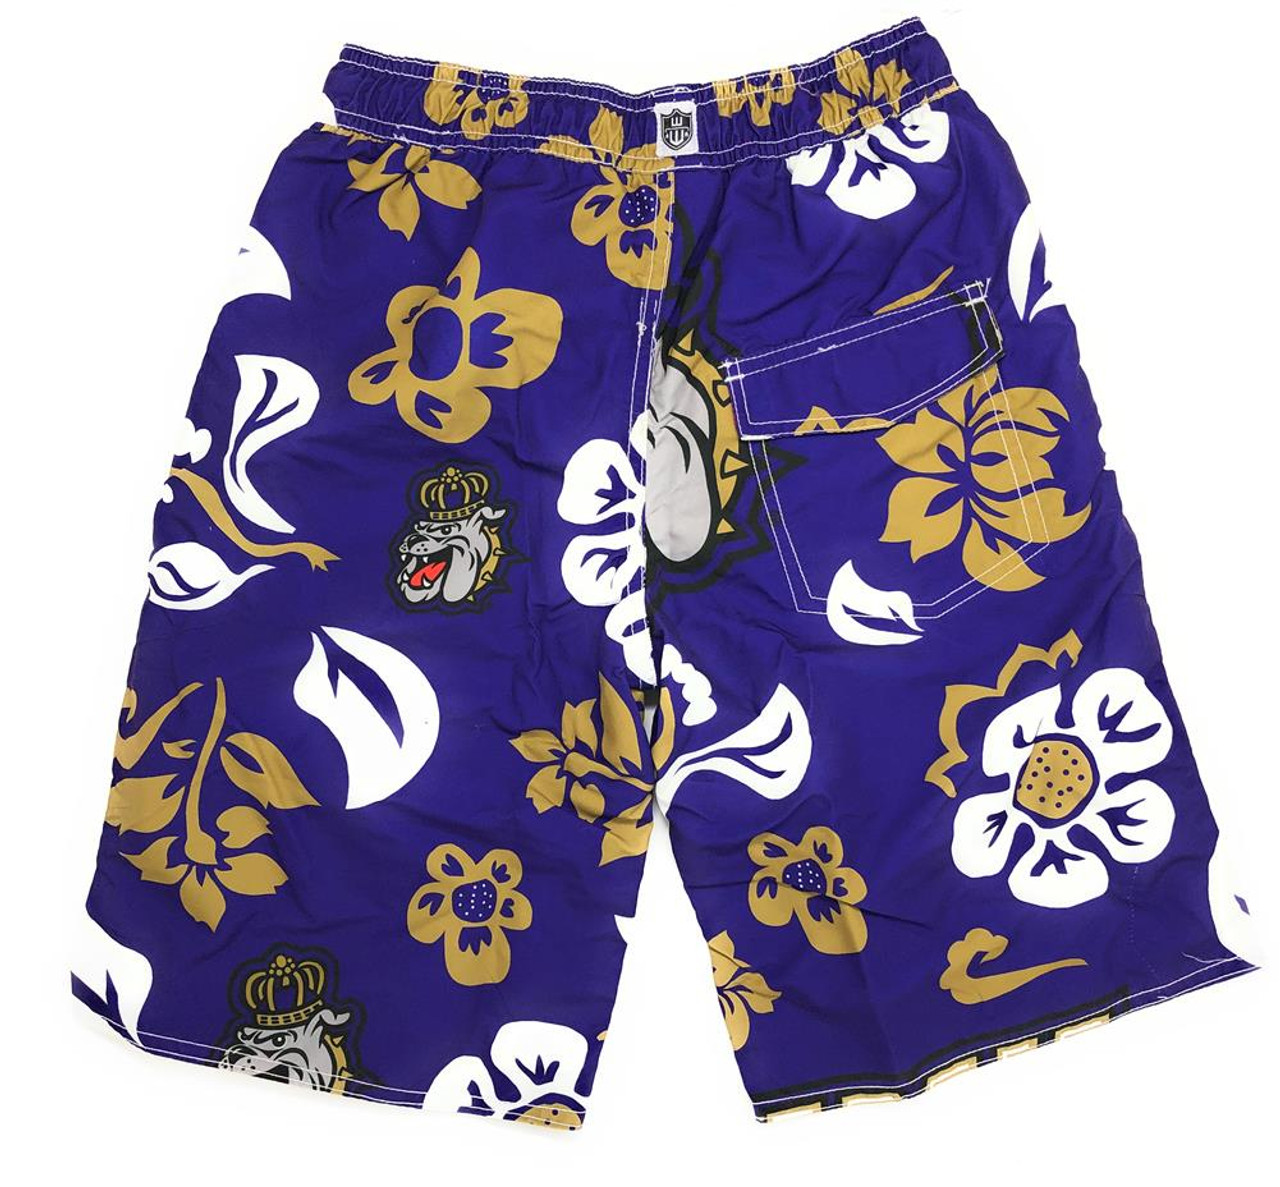 Youth James Madison Dukes Swim Trunks Boys Floral Swim Shorts